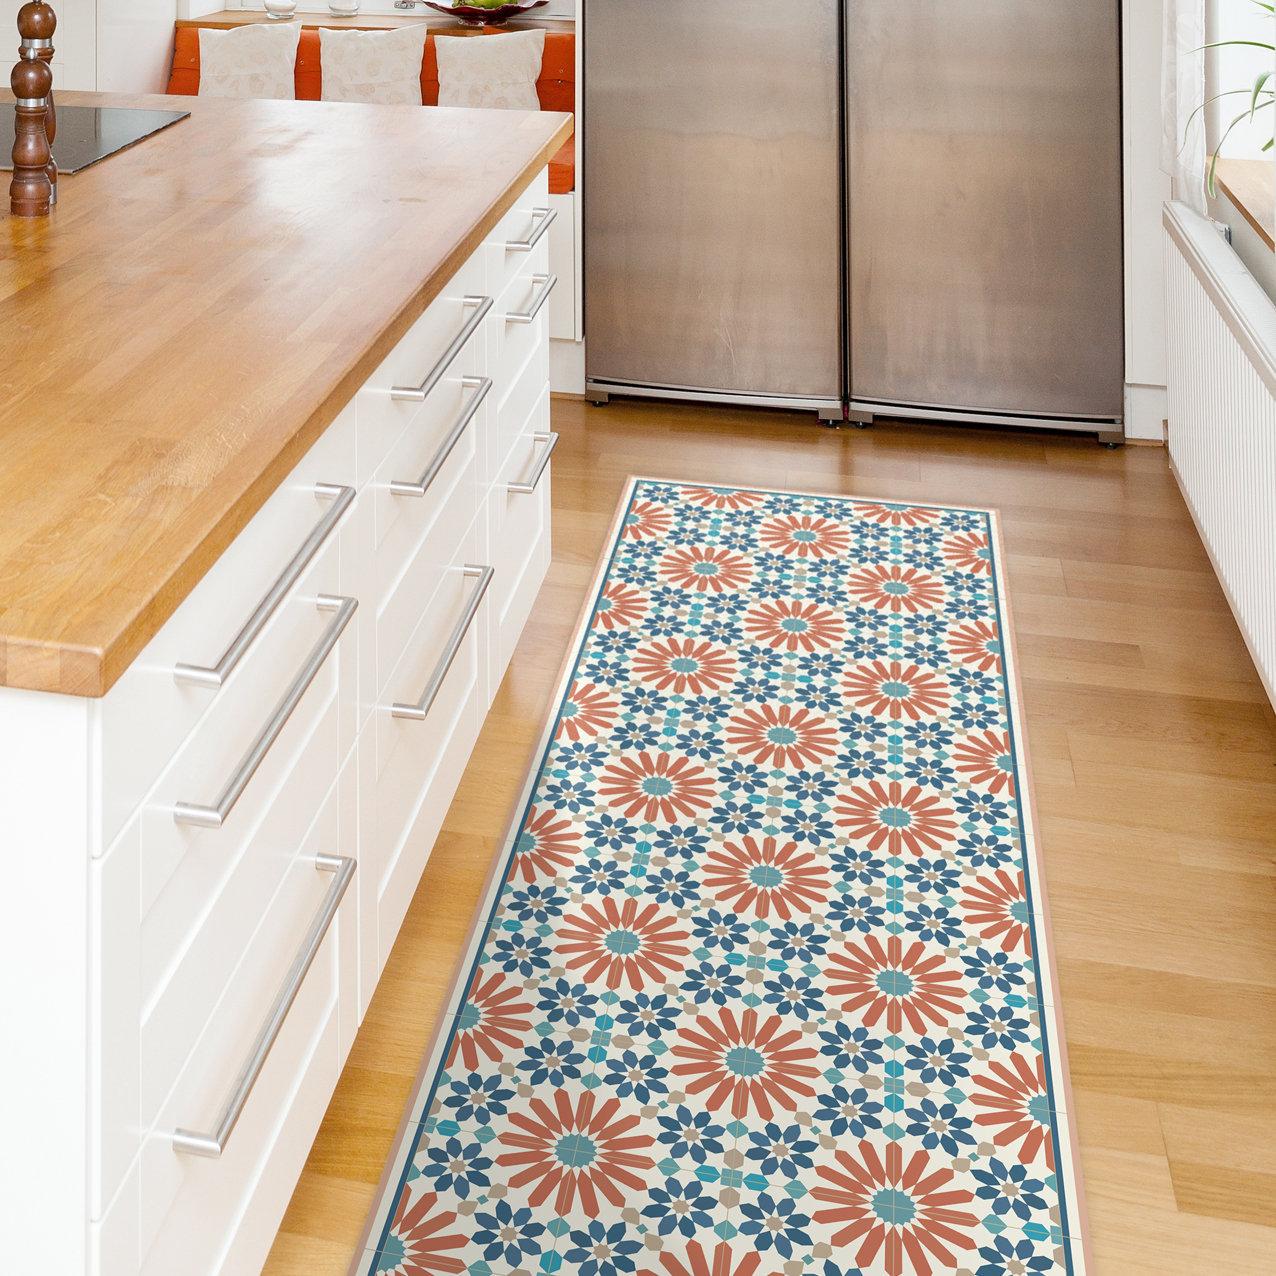 Orange and blue kitchen runner rug, printed on vinyl floor mat. Rug runner  with Moroccan tiles, kitchen runner, Orange rug, hallway runner.